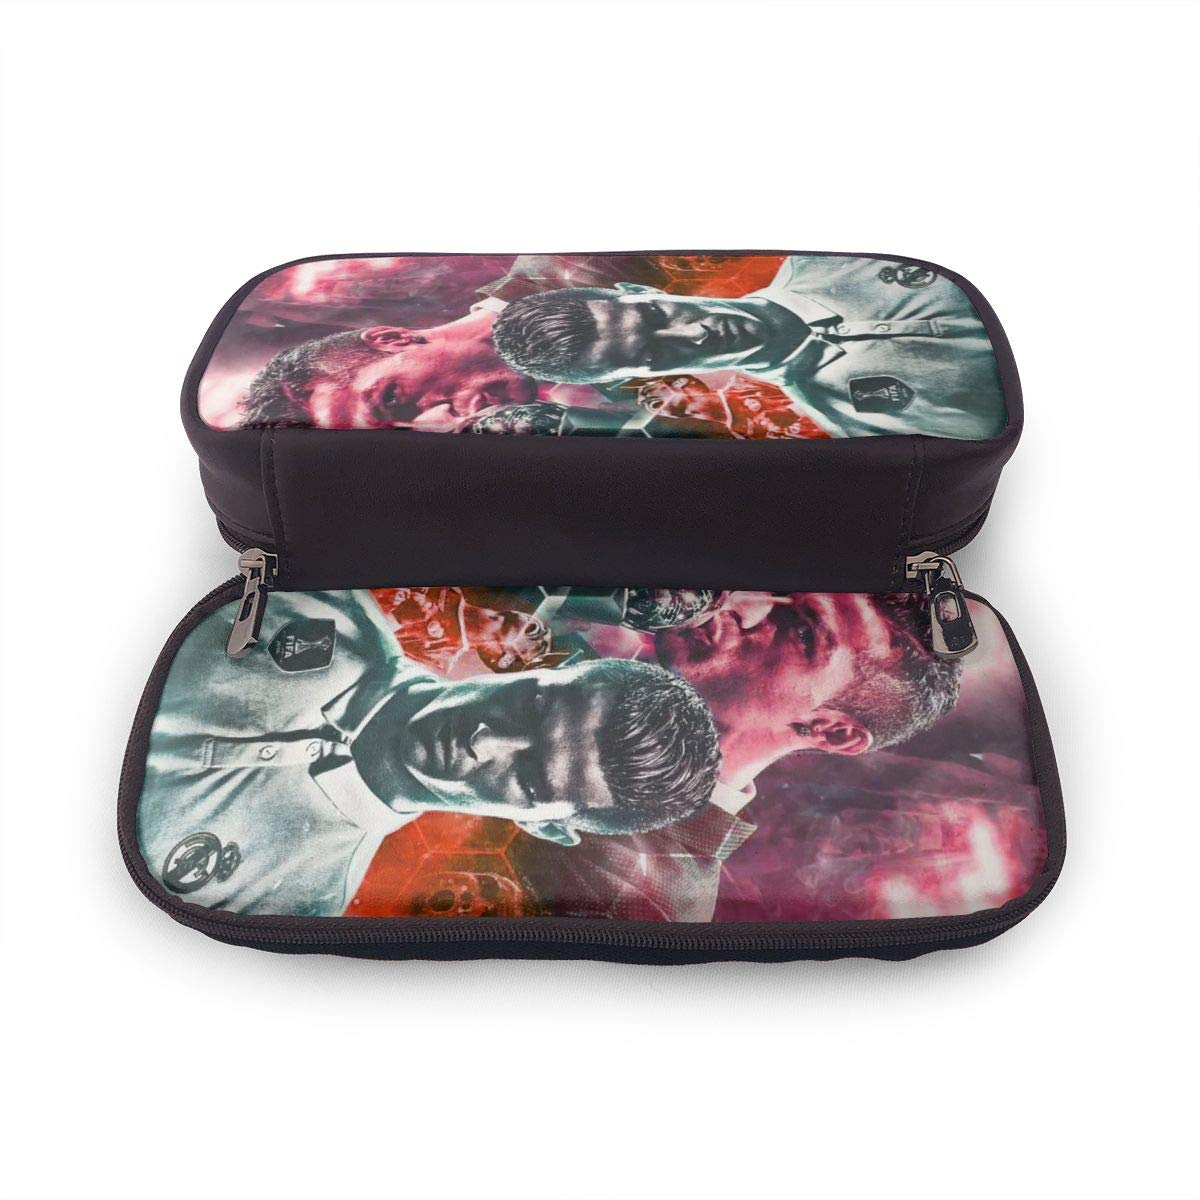 Kjanqa Pwryl Estuche Funda Big Capacity High Capacity Pen Pencil Pouch Box Organizer Practical Bag Holder With Zipper For School & Office - 7.88X3.54X1.58 Inches: Amazon.es: Oficina y papelería